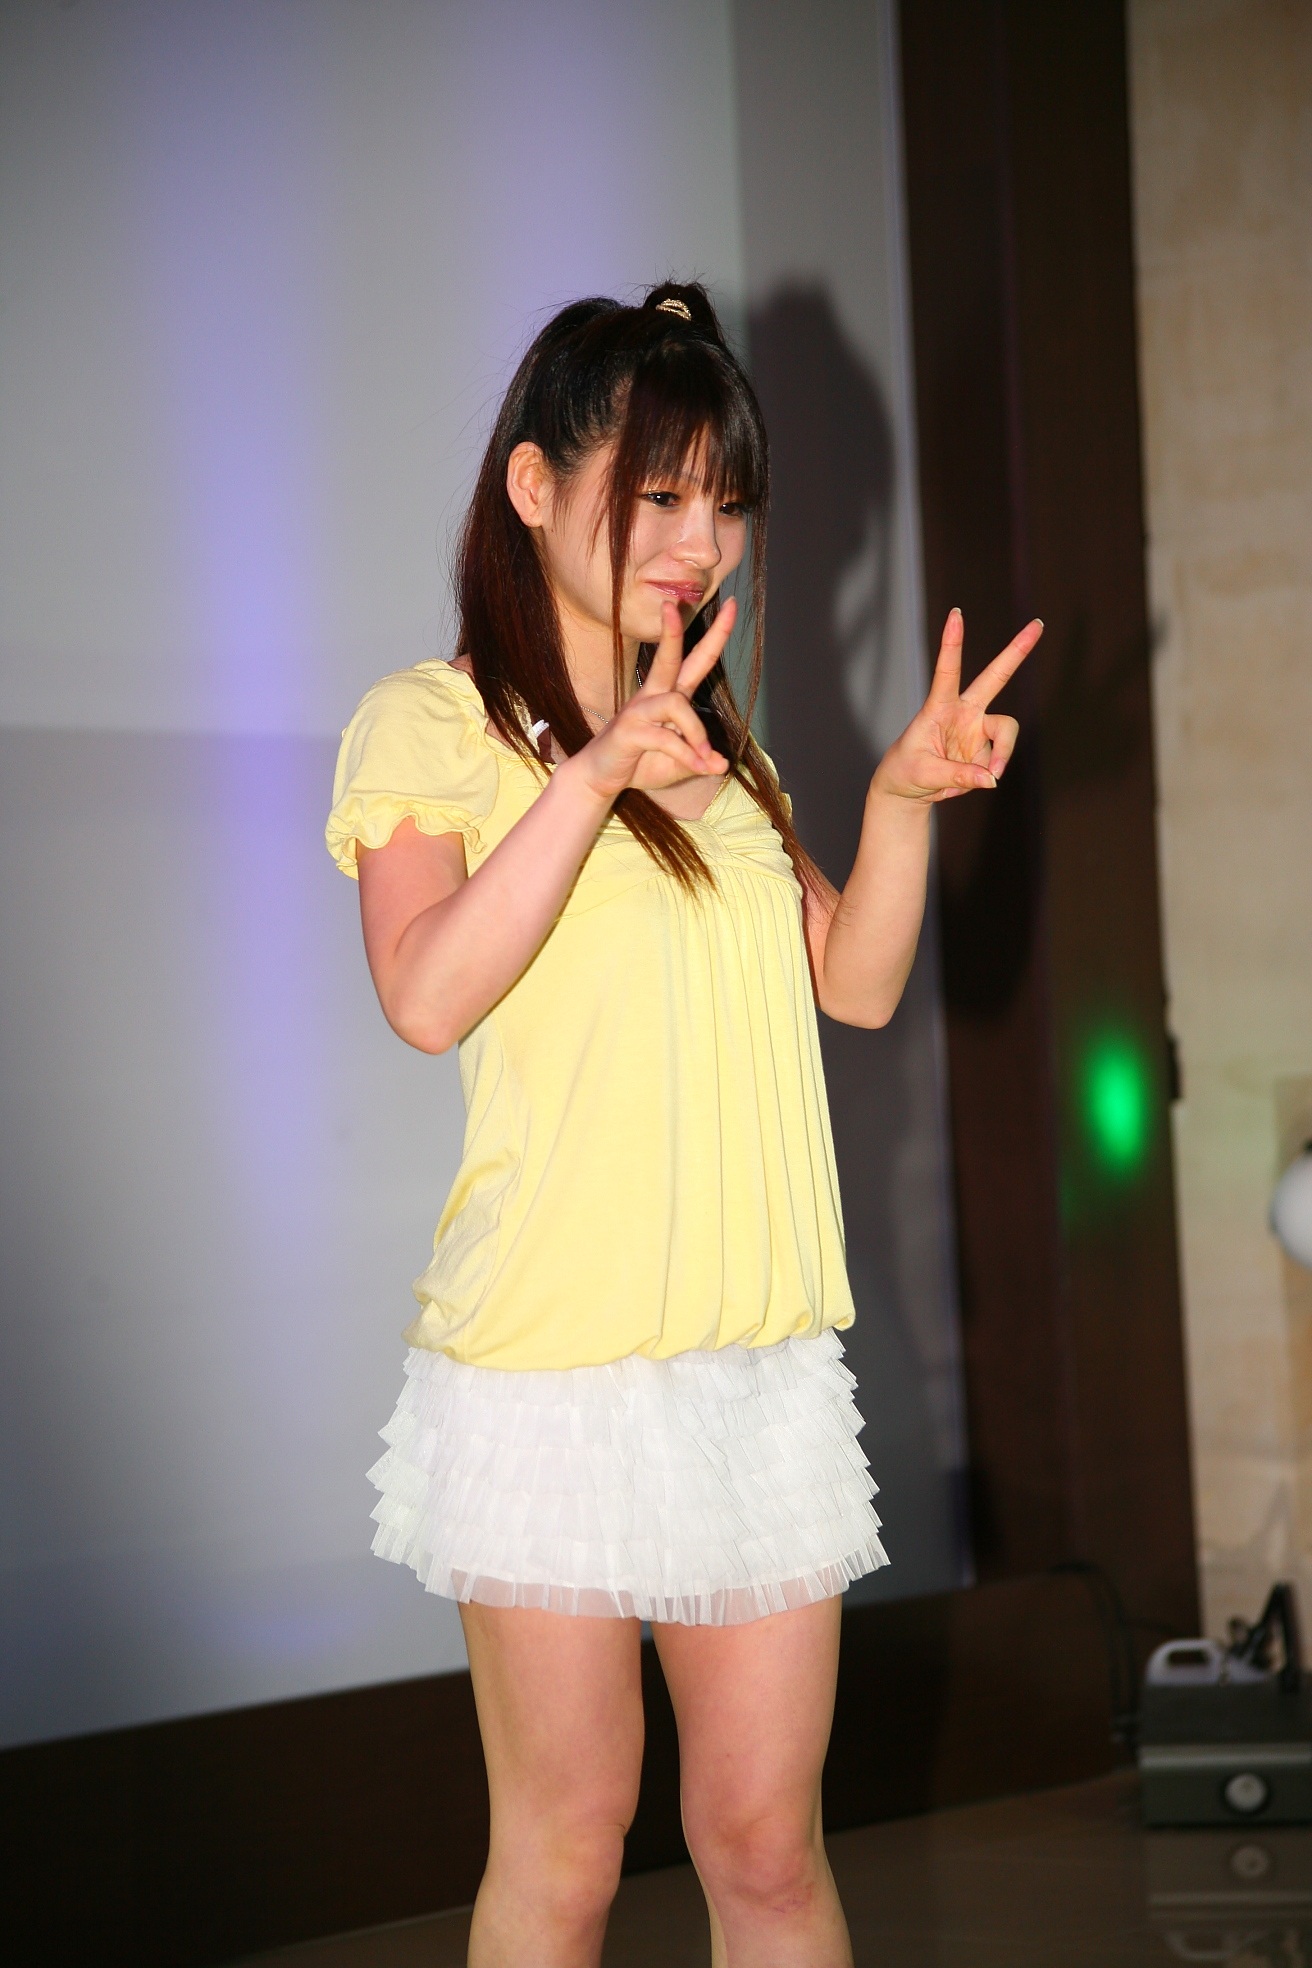 yuzumotosakiIMG_5344.JPG